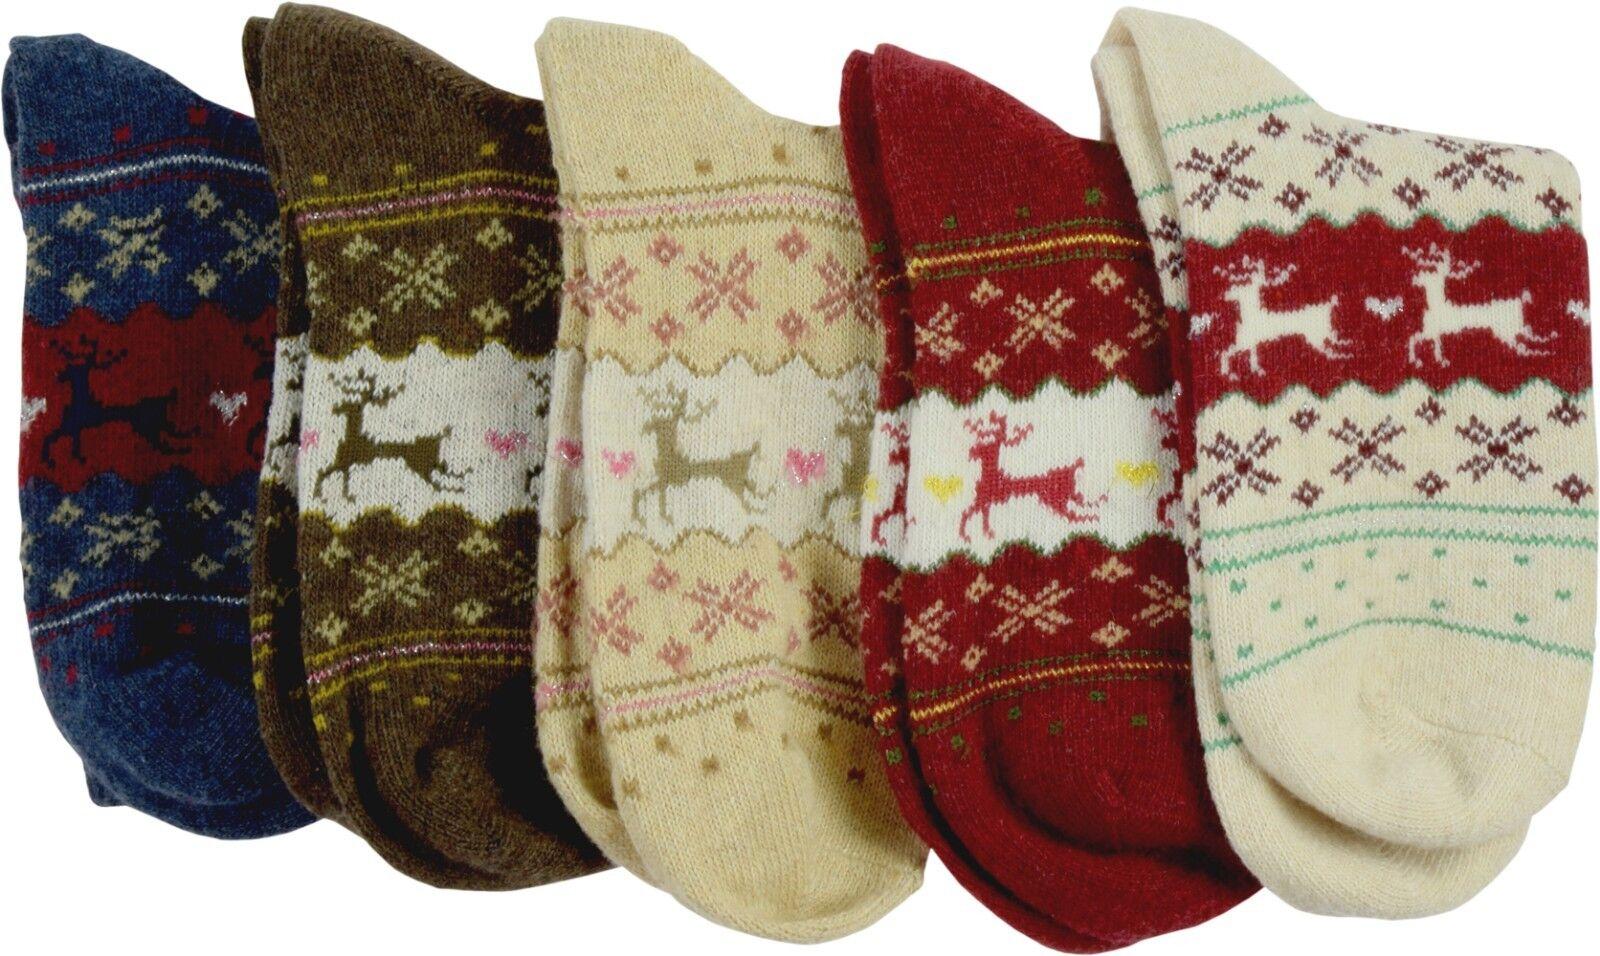 Pealu dicke RENTIER Socken (33-40) atmungsaktiv Baumwolle - verschiedene Designs